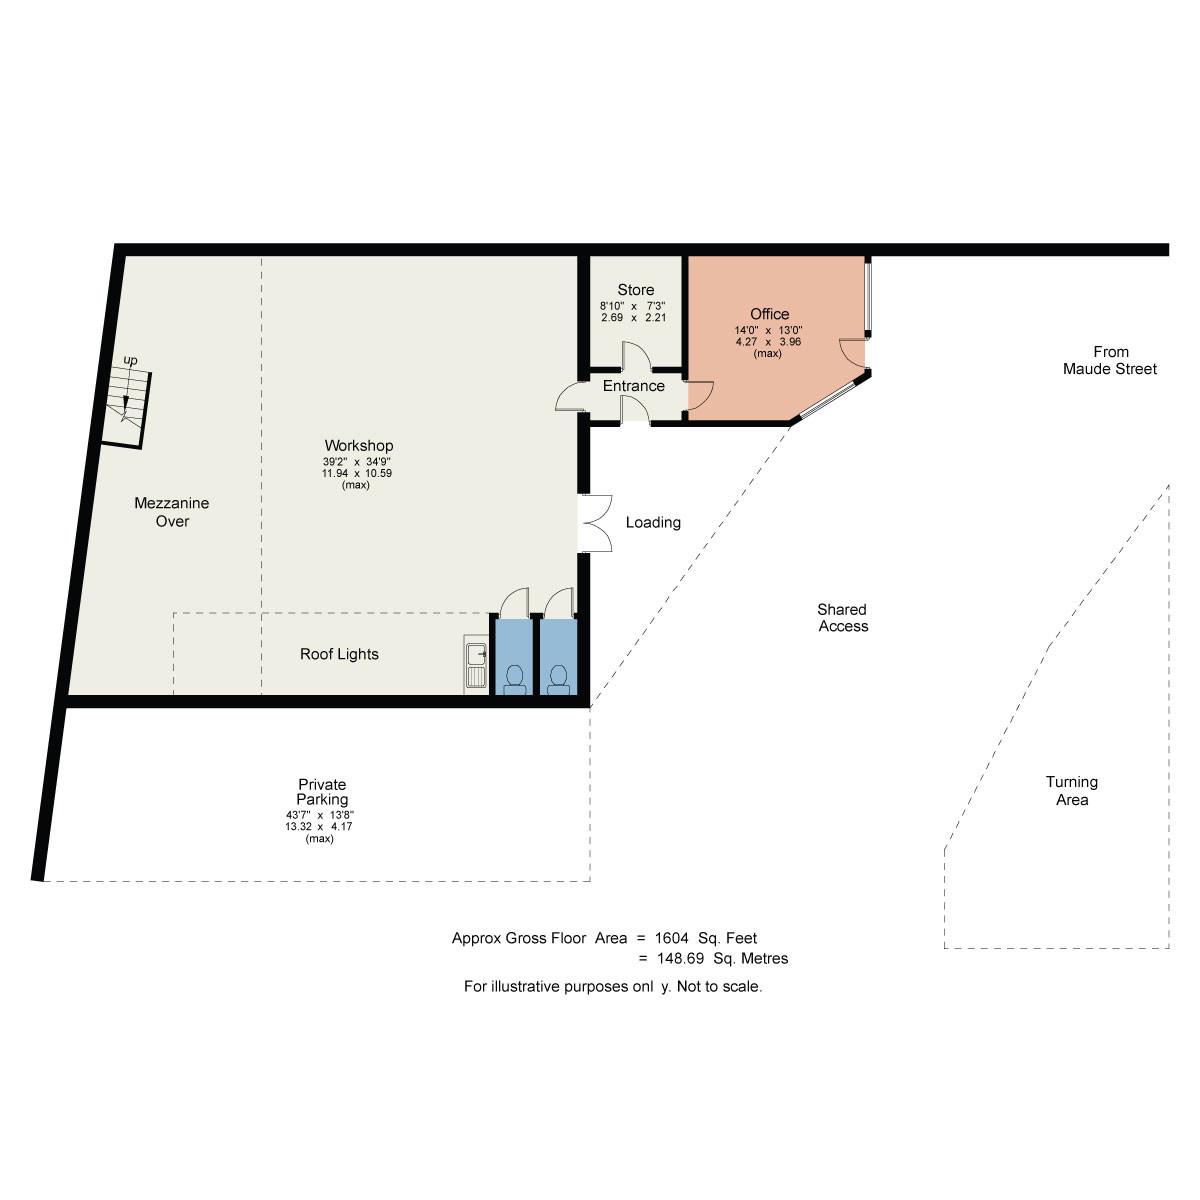 Floorplan Nobles Garage Maude Street Kendal Cumbria LA9 4QD